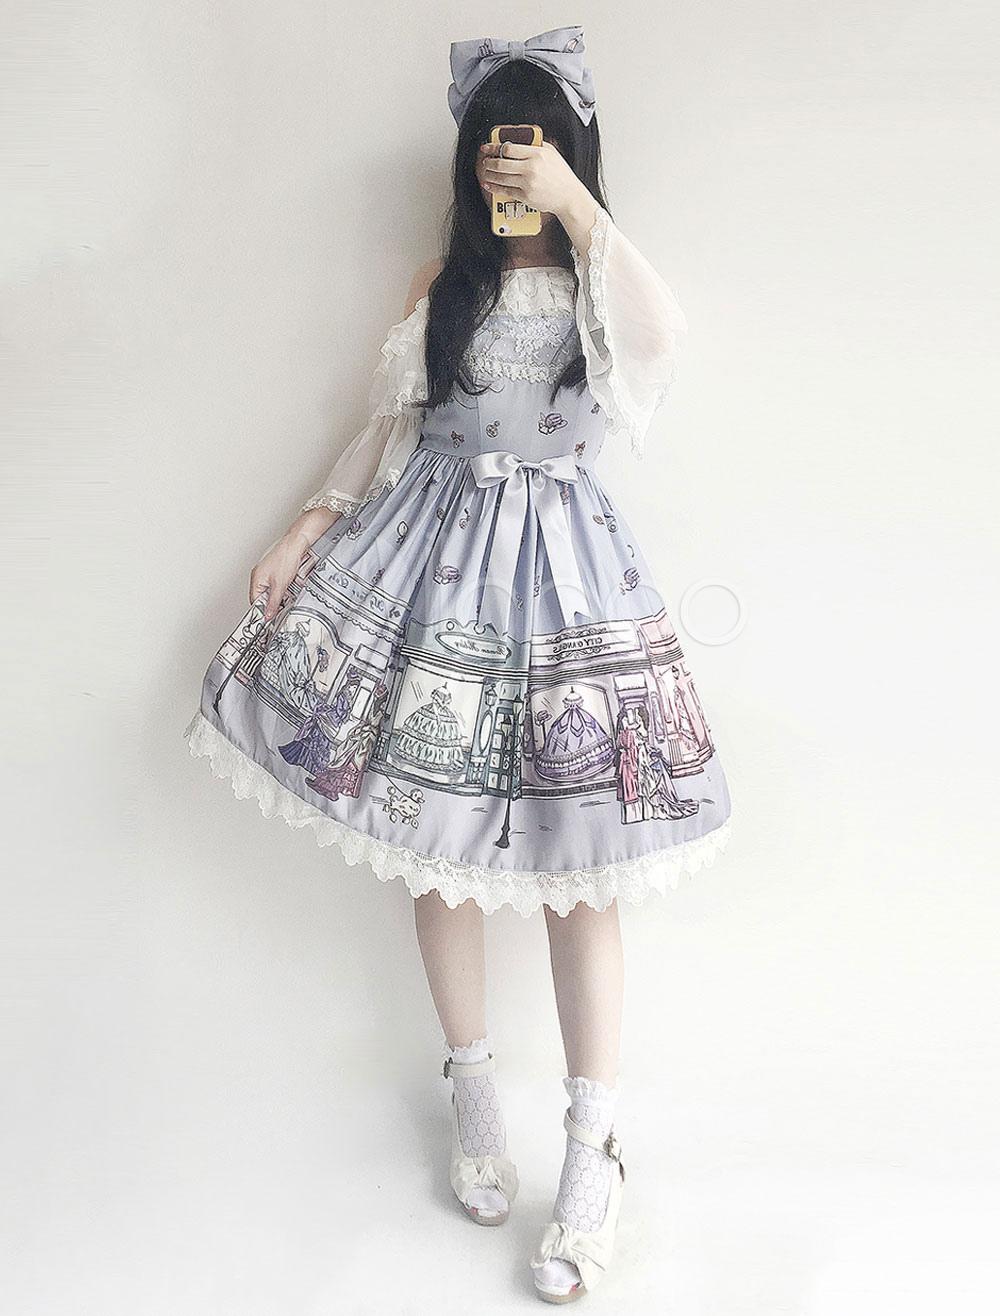 Buy Classic Lolita JSK Jumper Skirt Infanta Chiffon Lace Pleated Fairytale Printed Illusion Blue Lolita Dresses for $60.29 in Milanoo store